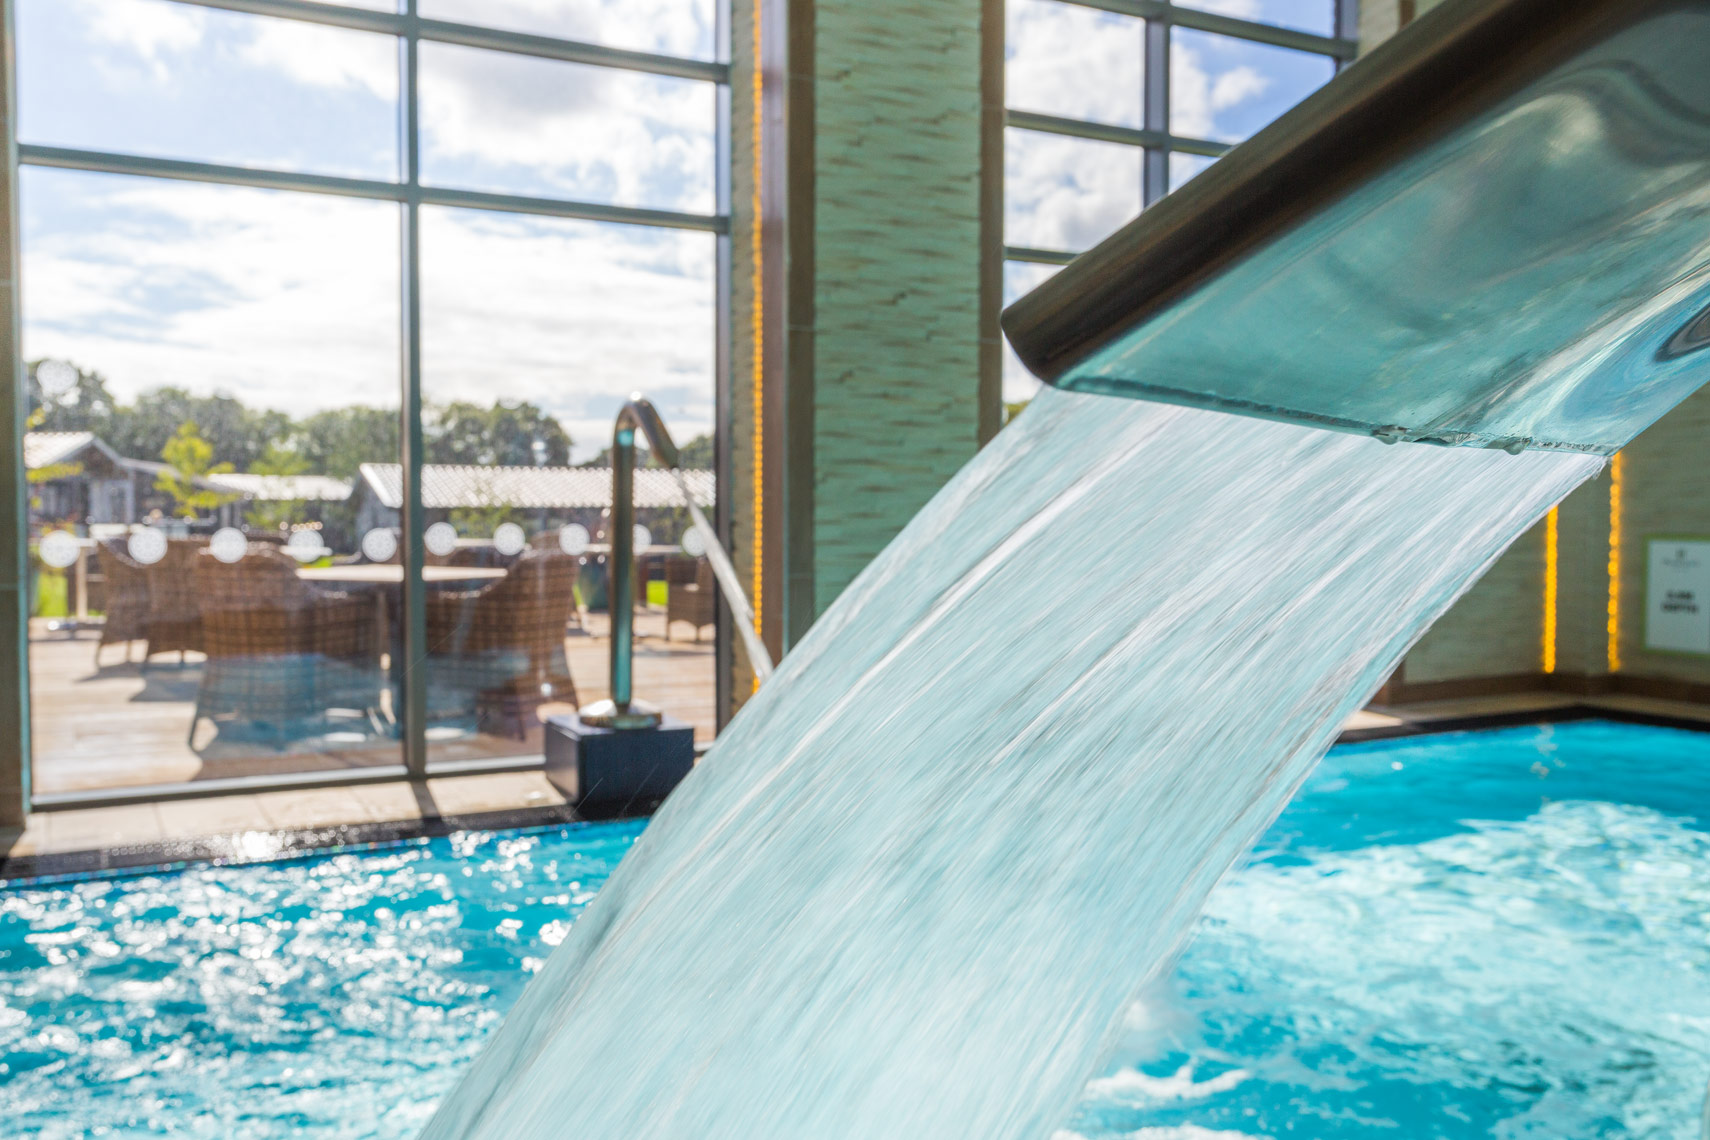 Hydro pool detail photo